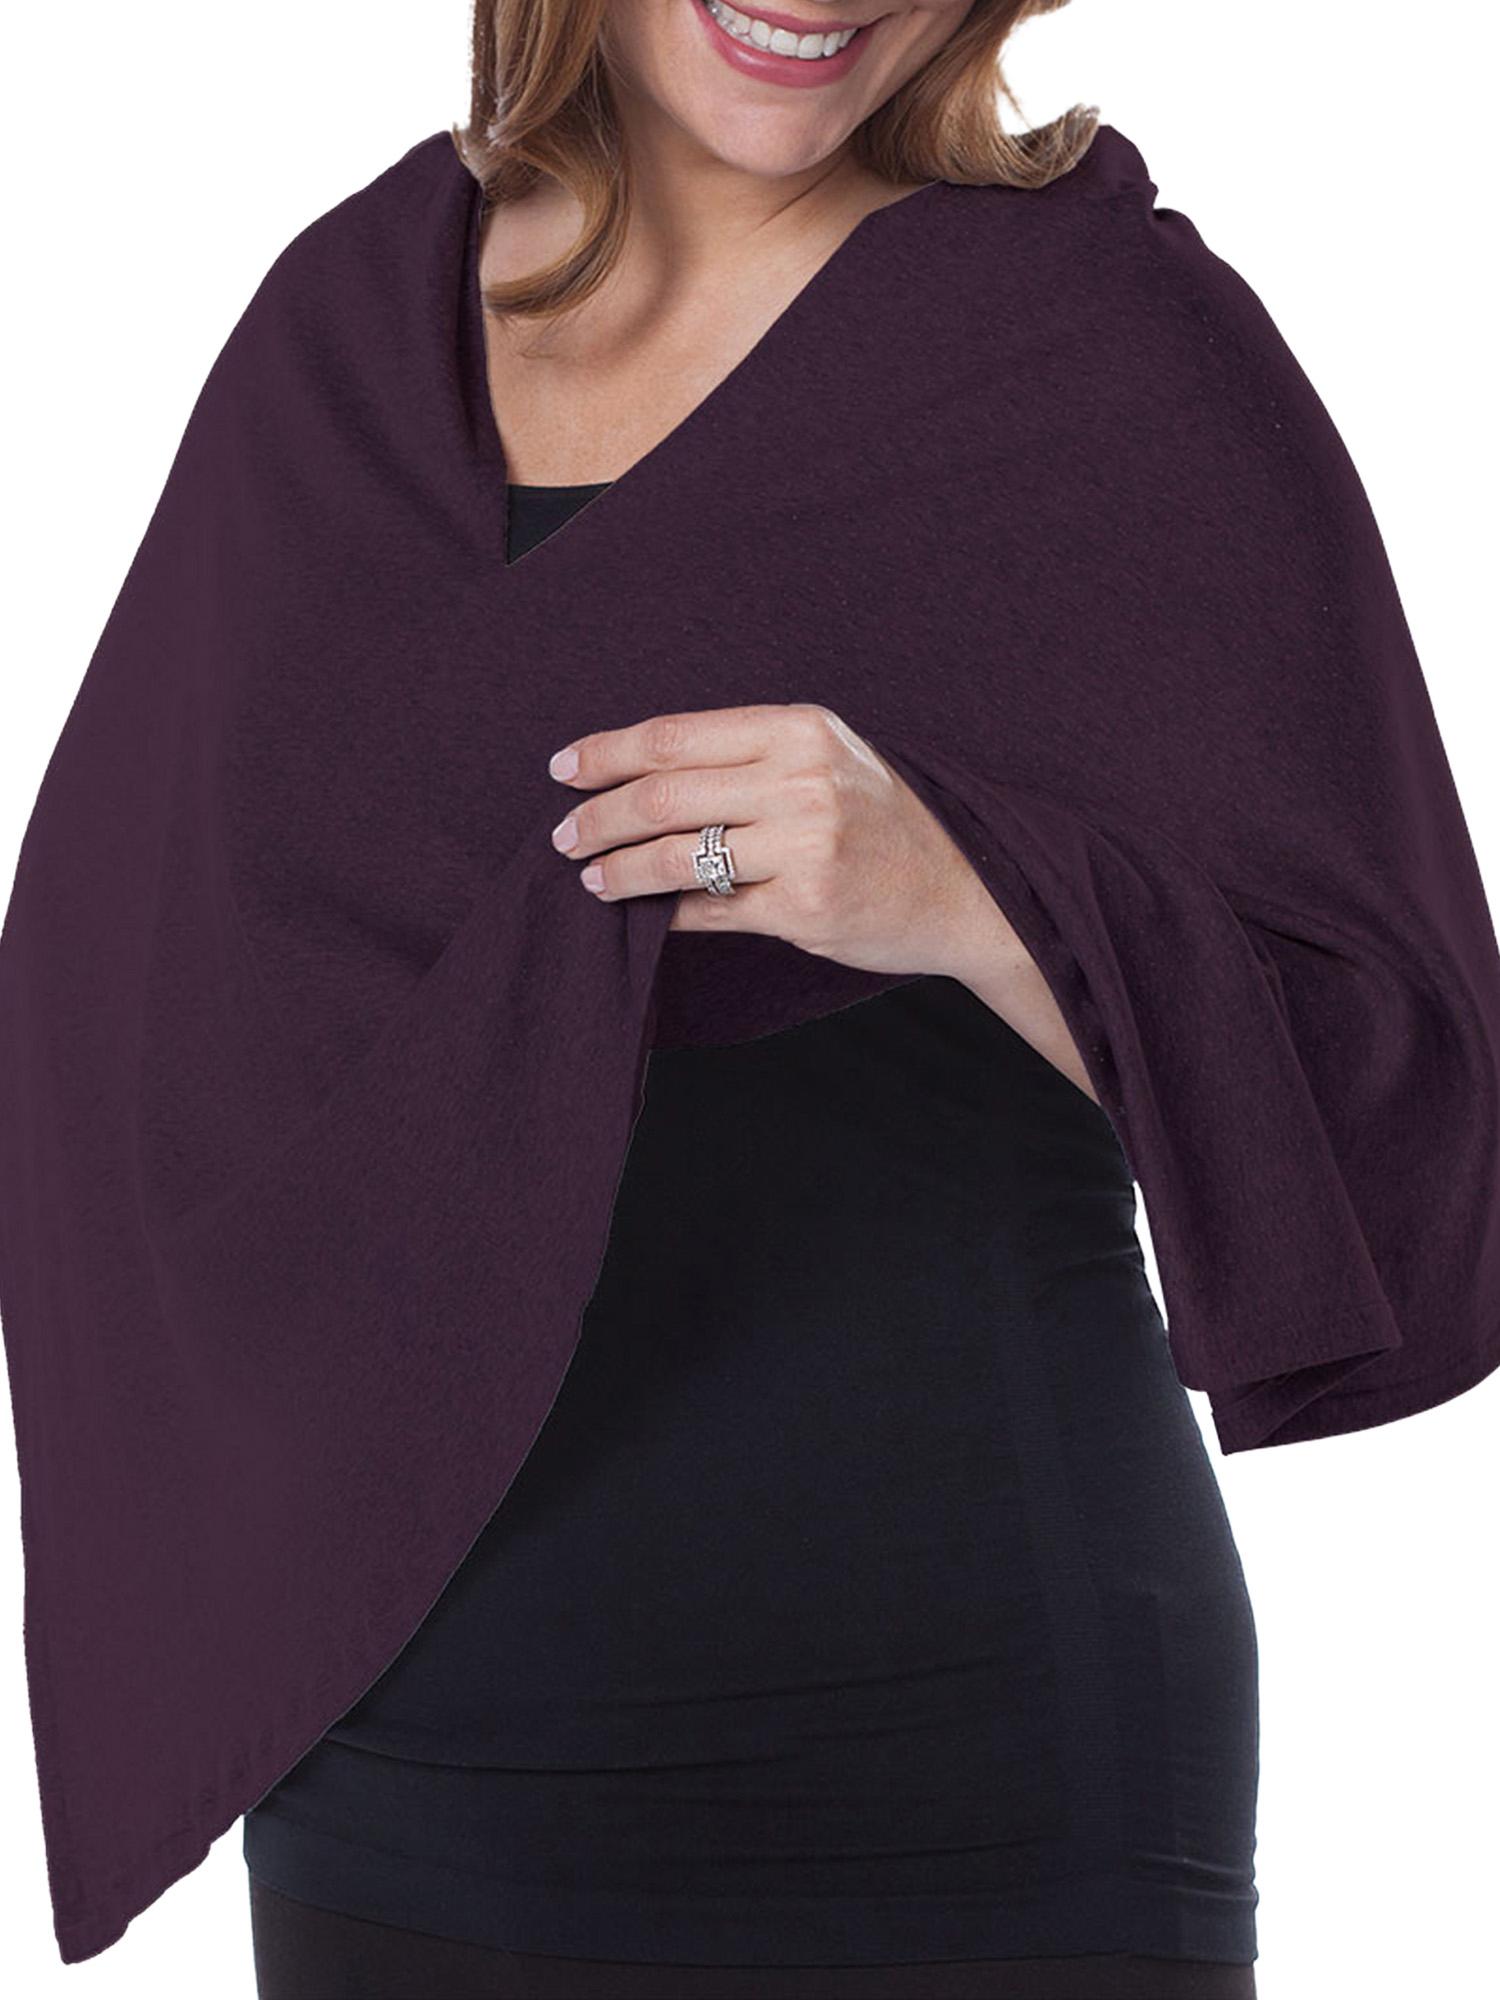 Maternity Nursing Cover Converts to Fashionable Nursing Scarf